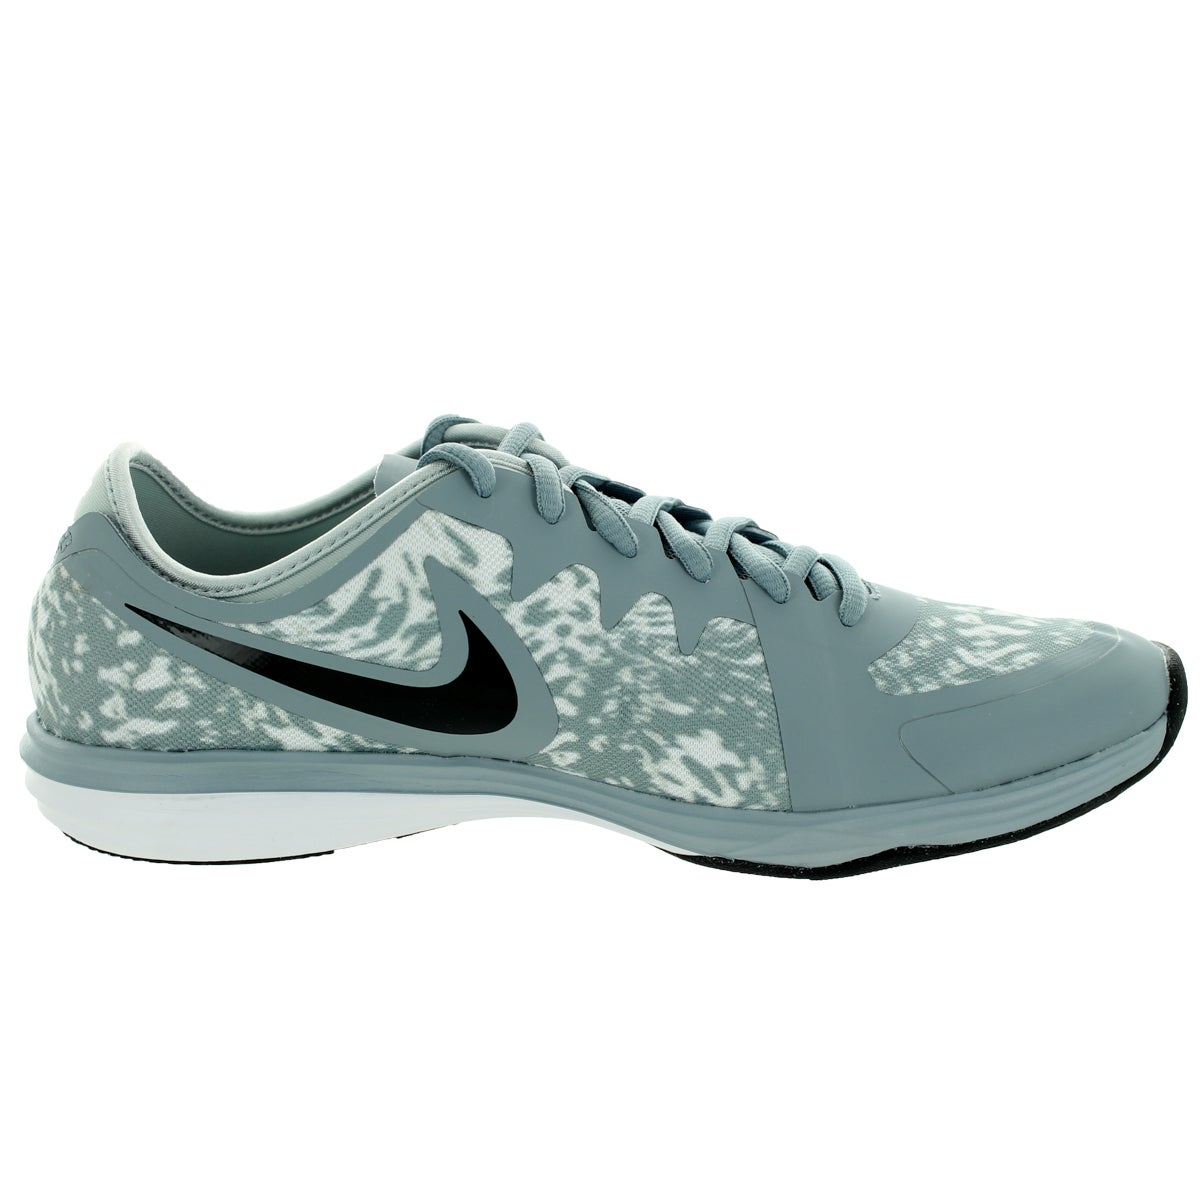 Nike Women's Dual Fusion Tr 3 Print Dove Grey/Black/ Mist...